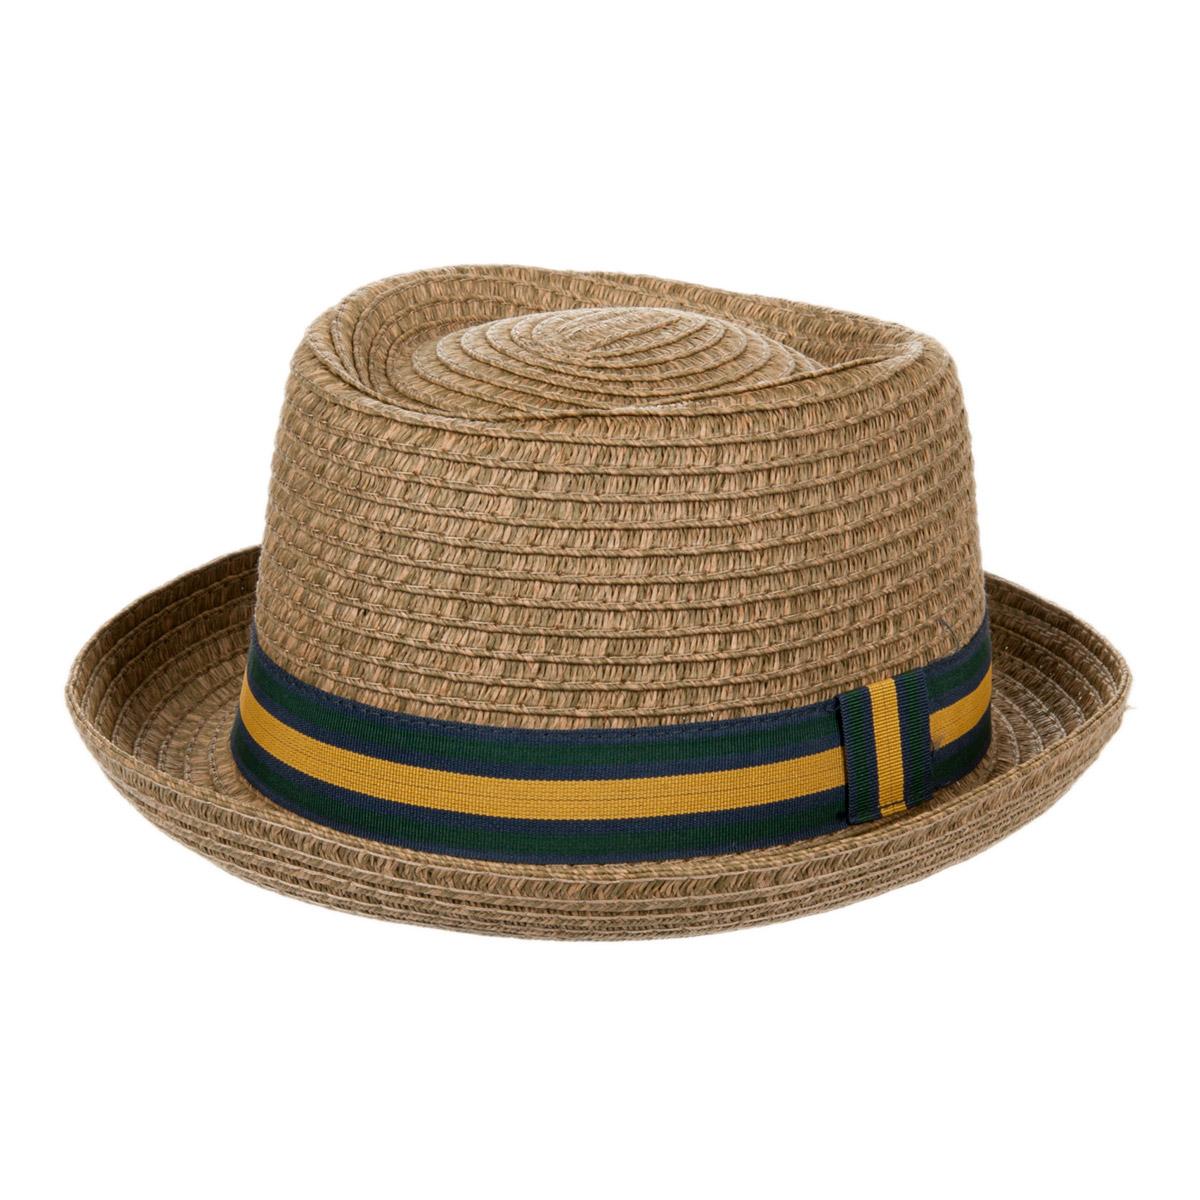 53b2b689f2a Cool pork pie summer hat